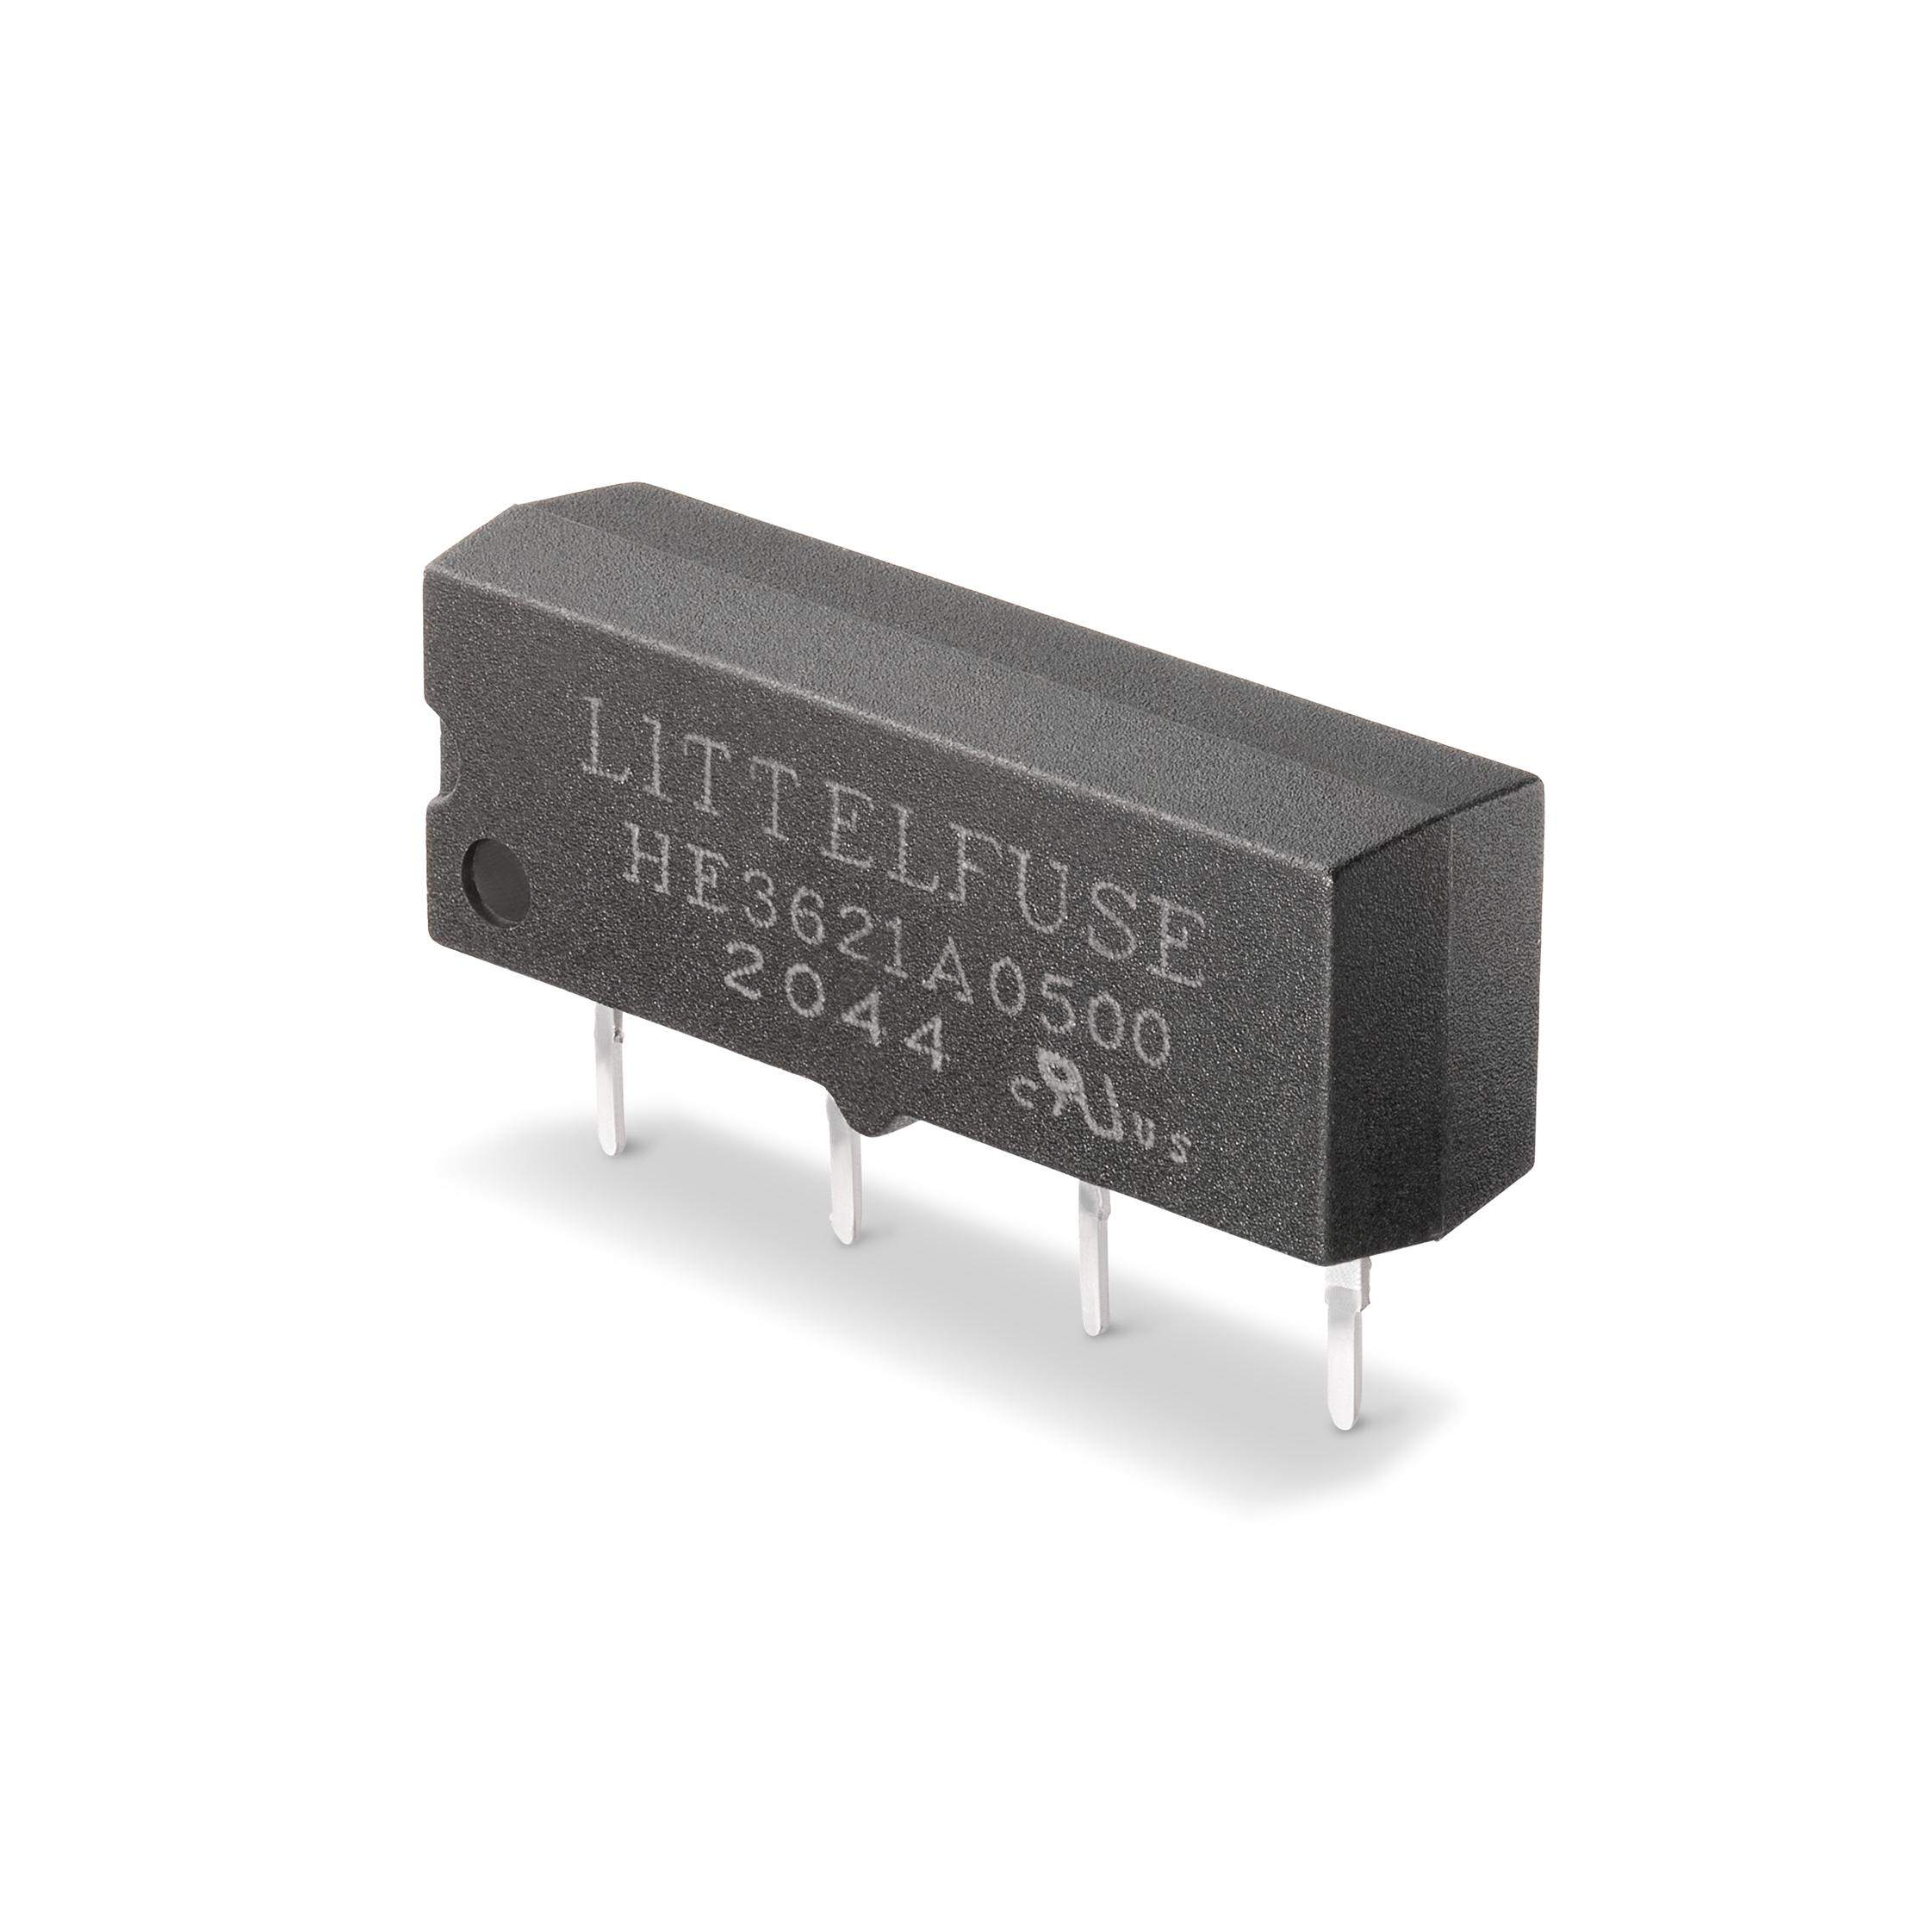 HE3600 Series Image